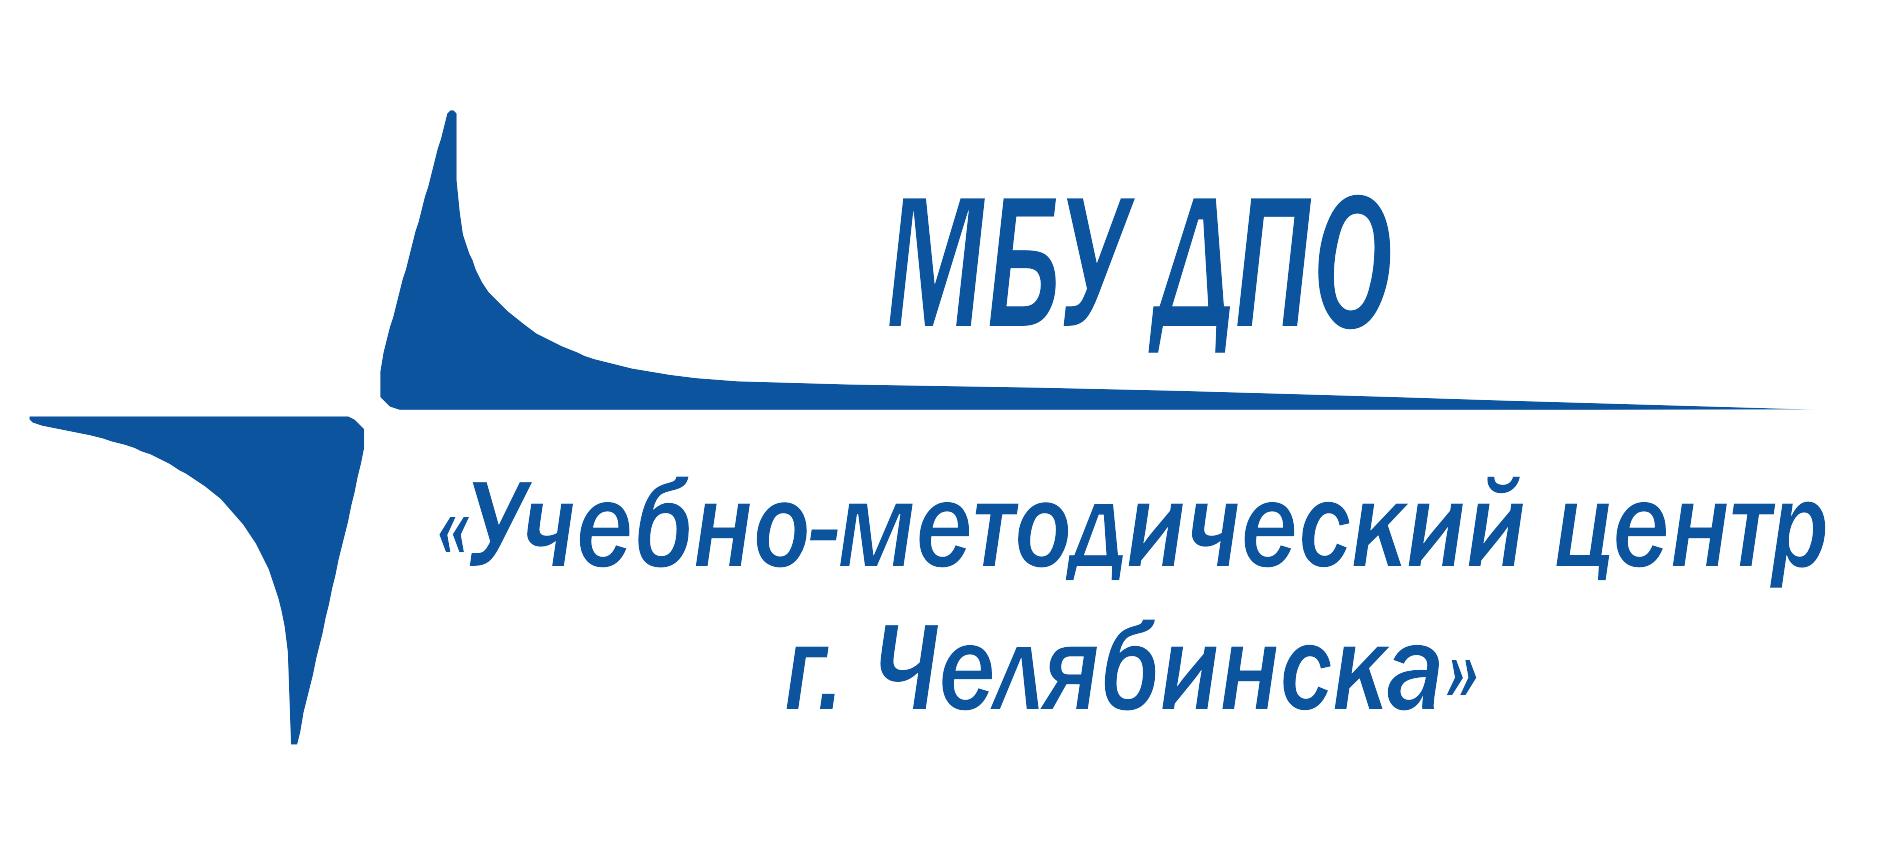 http://umc.chel-edu.ru/New%20Folder/doc_b/%D0%9B%D0%BE%D0%B3%D0%BE%D1%82%D0%B8%D0%BF_%D0%A3%D0%9C%D0%A6_2016_%D1%86%D0%B2%D0%B5%D1%82%2012%2084%20158.png